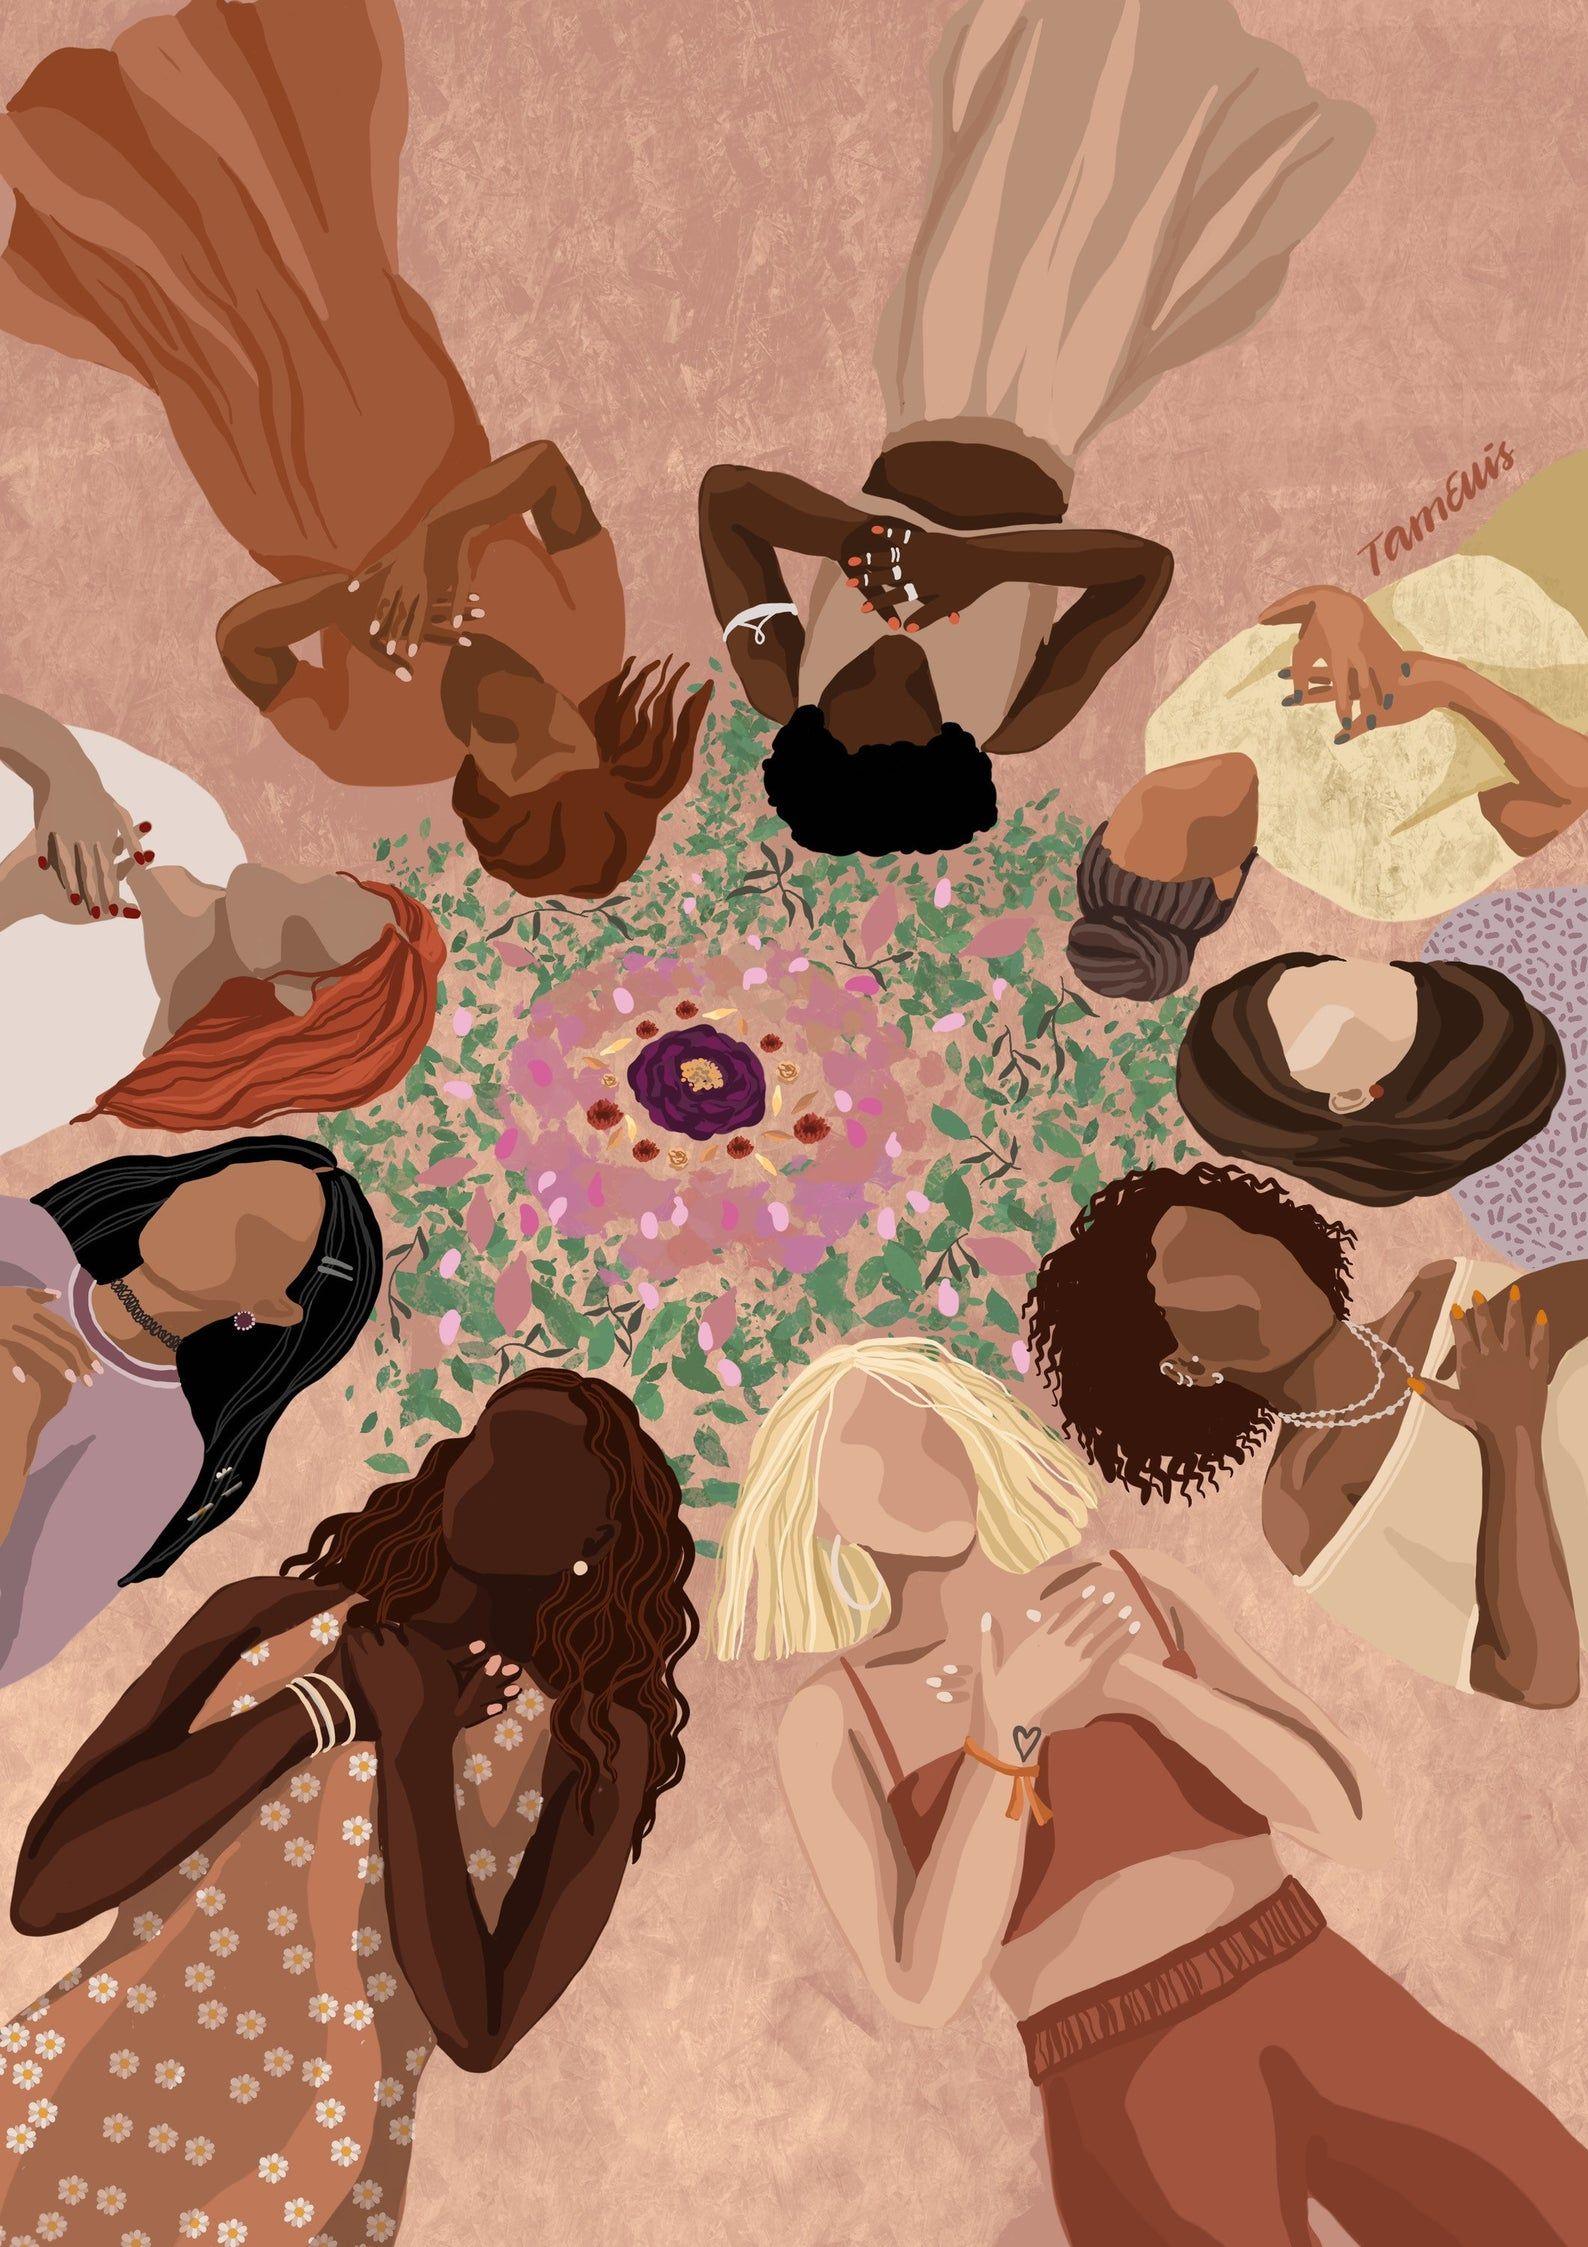 We are One - Fine art print, unity illustration